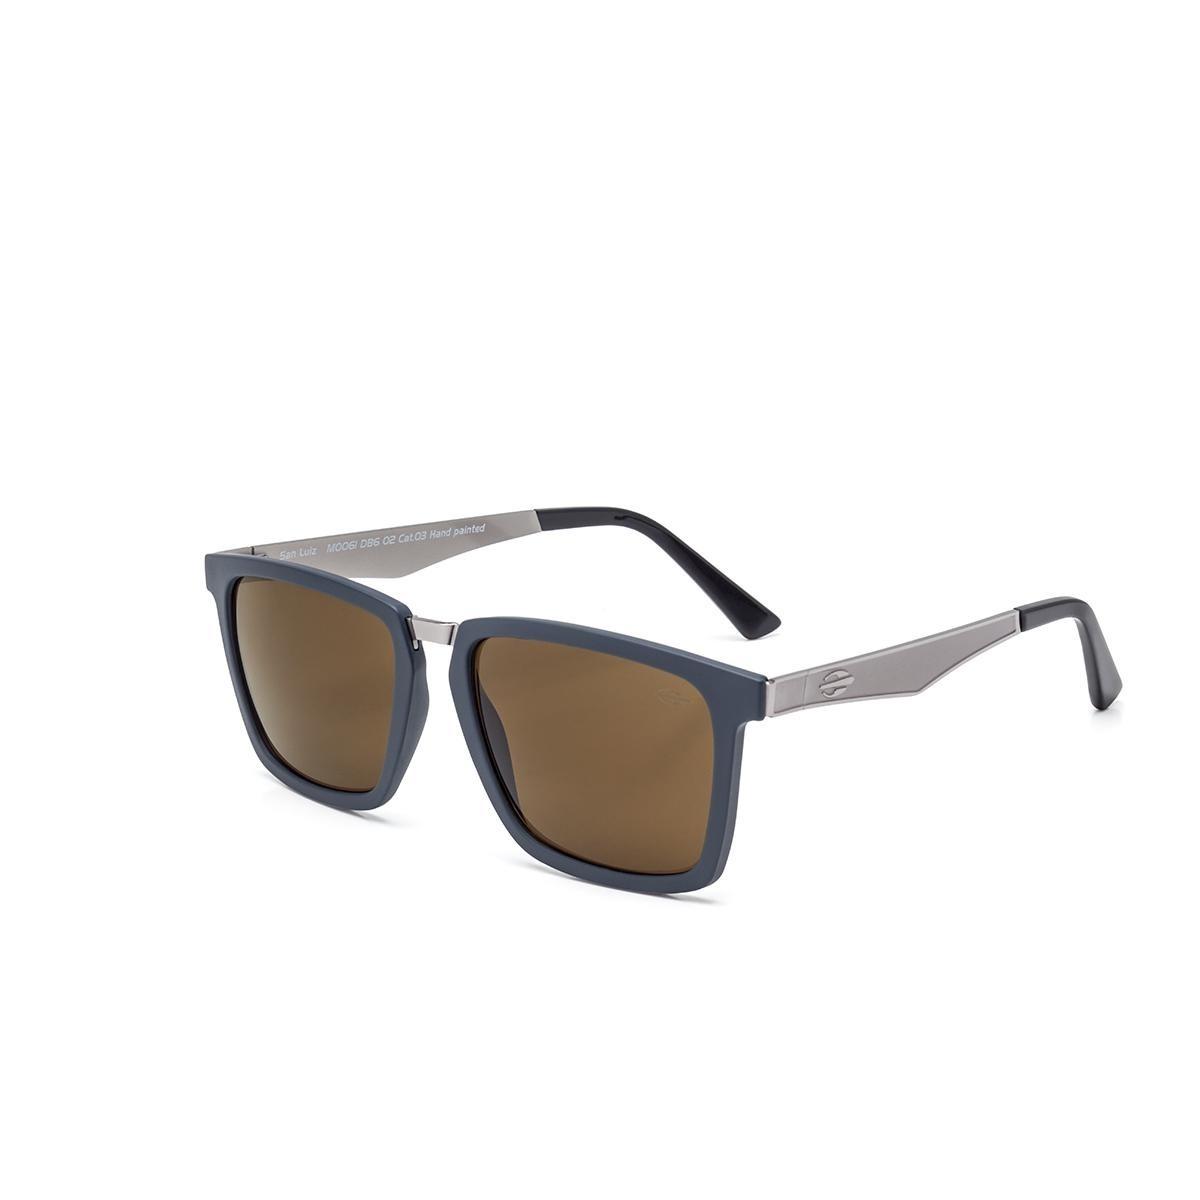 Óculos De Sol Mormaii Mod. M0061db602 C  Nf - R  164,48 em Mercado Livre 8ddaeadfc9